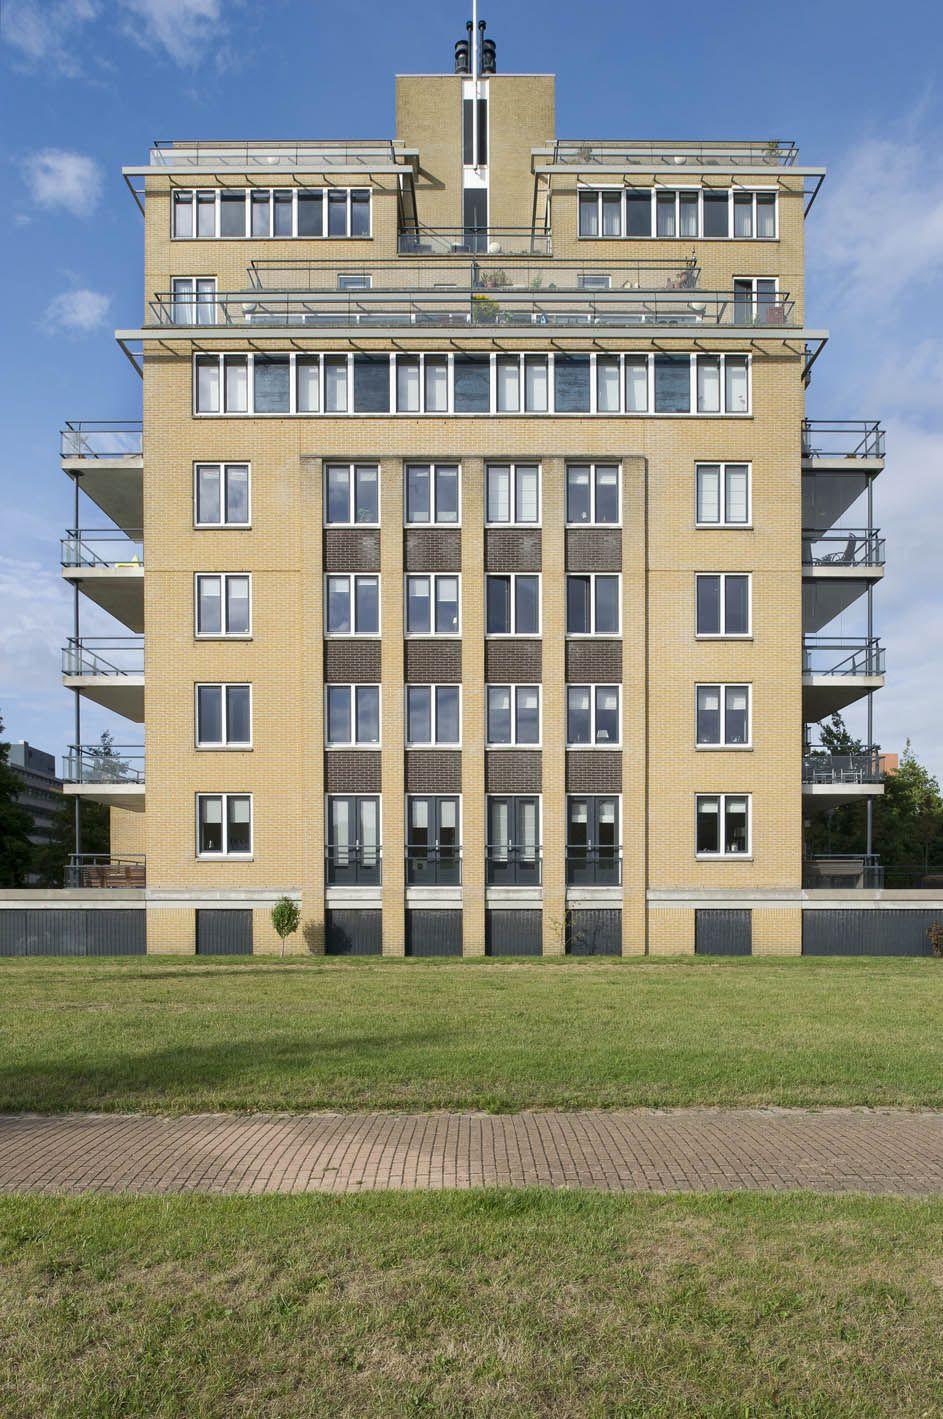 Cornelis Voorhoevelaan, Sijtwende, Voorburg.